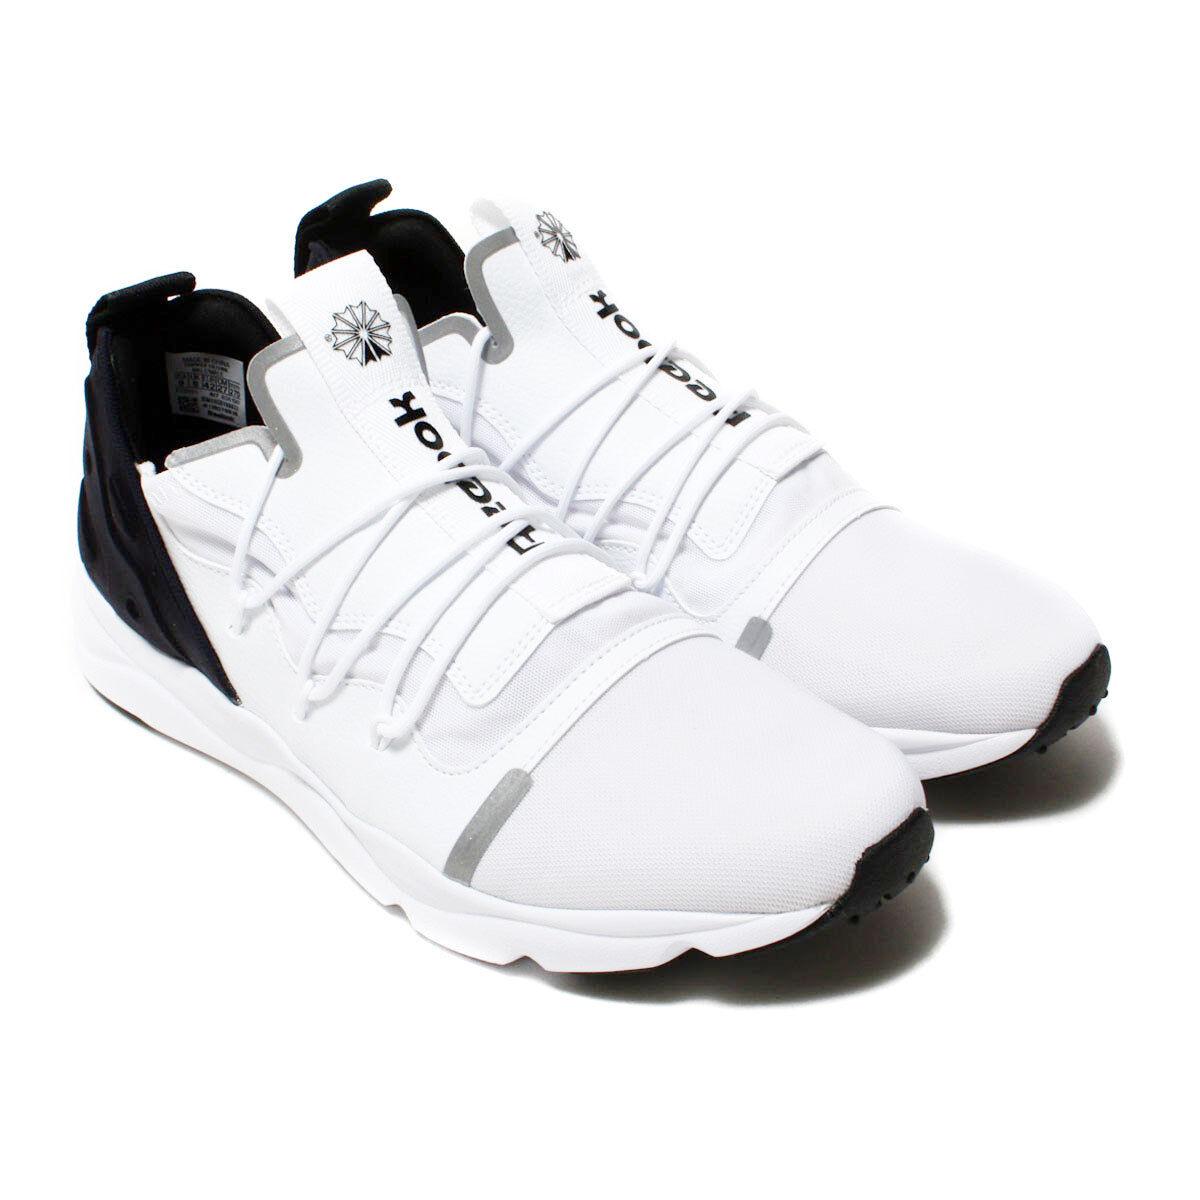 Reebok Reebok Reebok FURYLITE X Men Sneaker Weiß BS6190 Gr:39 Original Weiß Schuh Classic c515c5